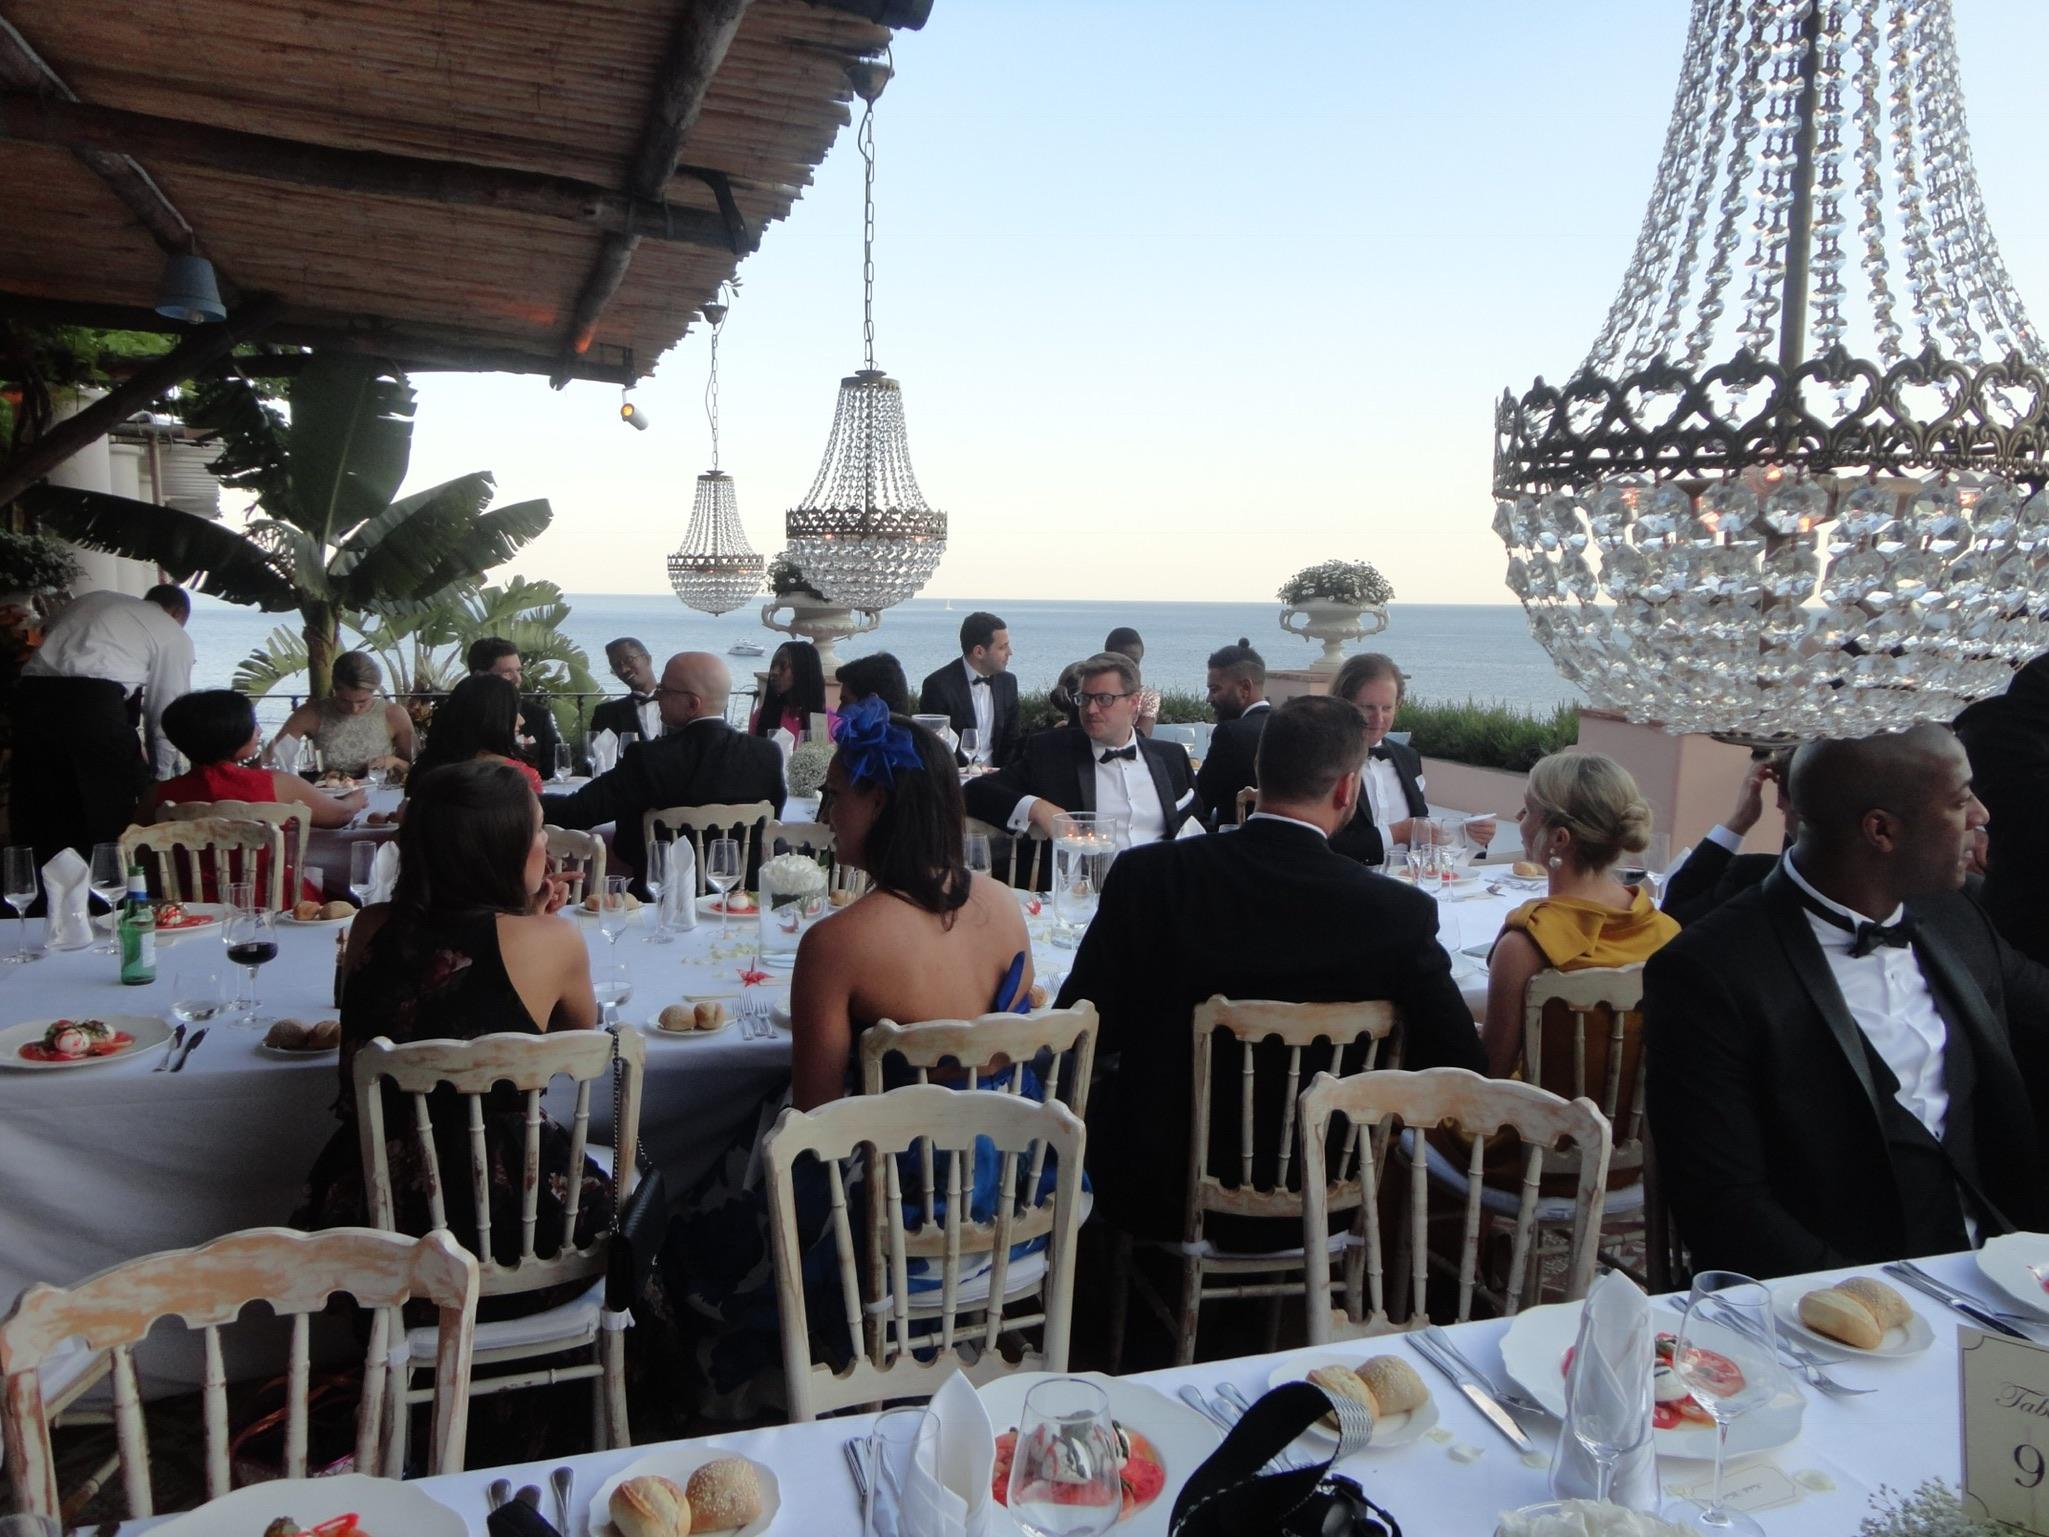 http://www.weddingamalfi.com/wp-content/uploads/Nathalie-and-Benjamin-Wedding-in-Positano-Italy-9.jpg